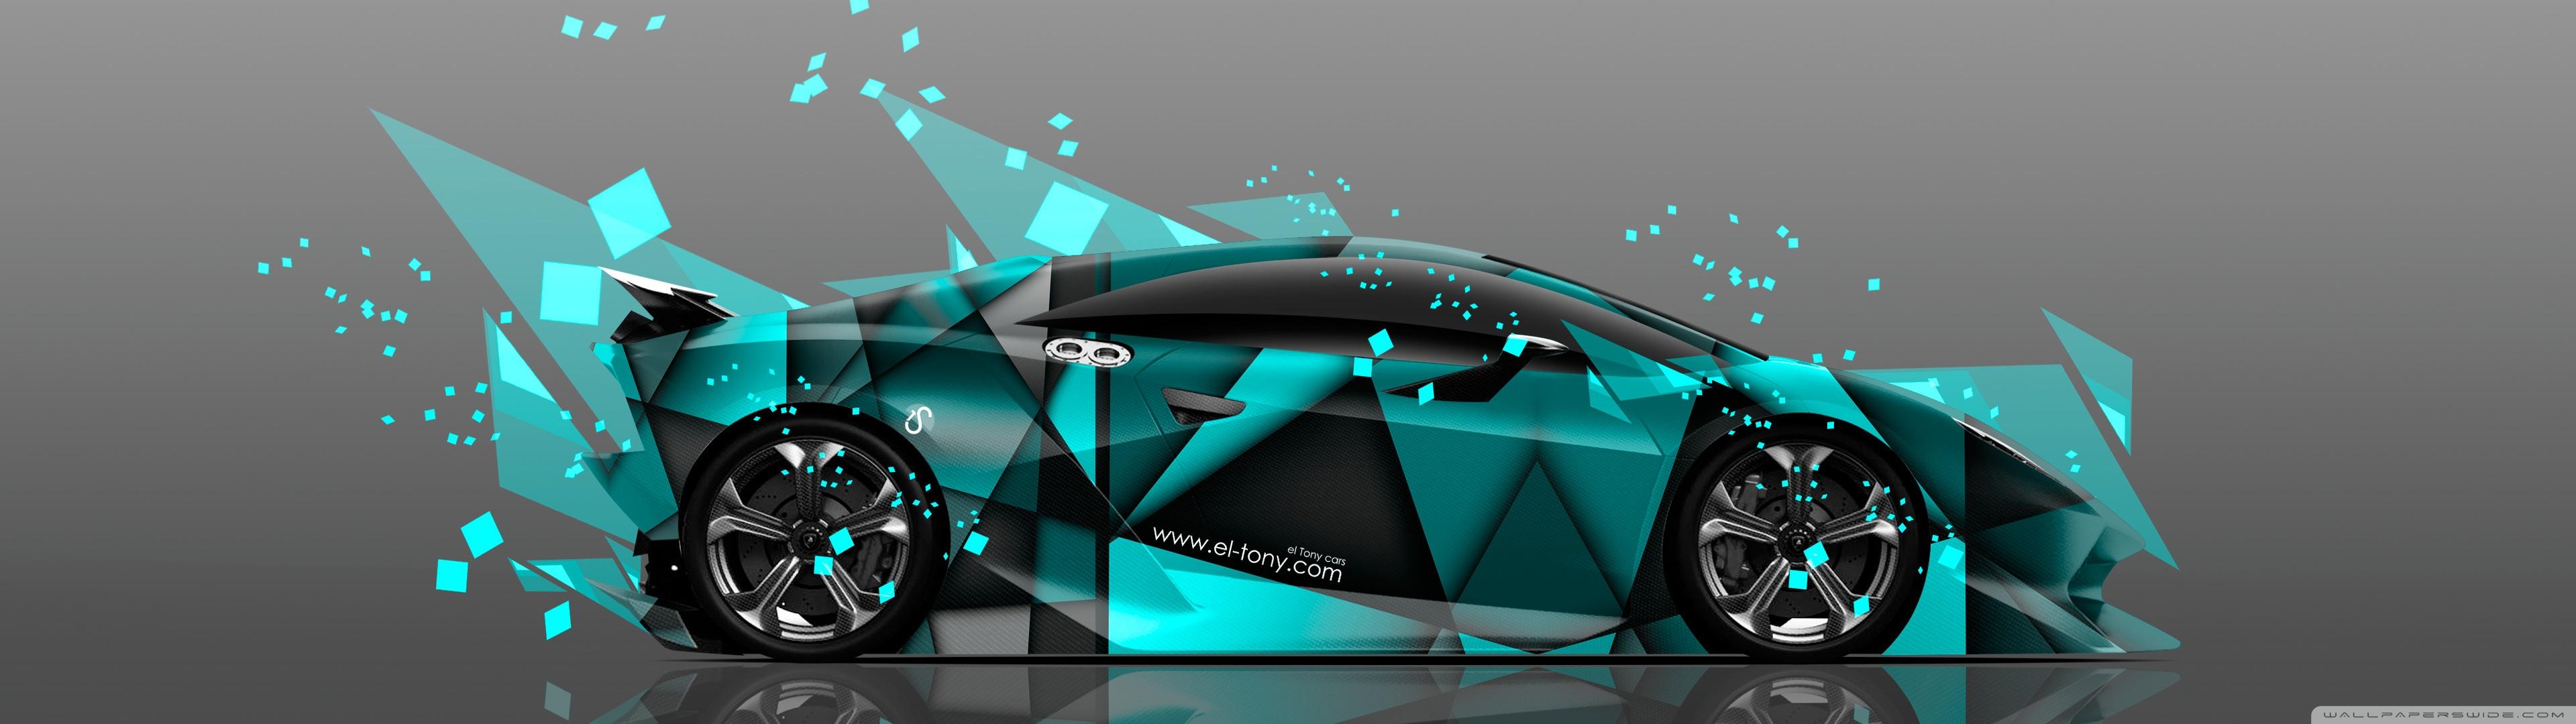 Car Dual Monitor Wallpaper 3840x1200 Lamborghini Sesto Elemento Abstract Aerography Car Design